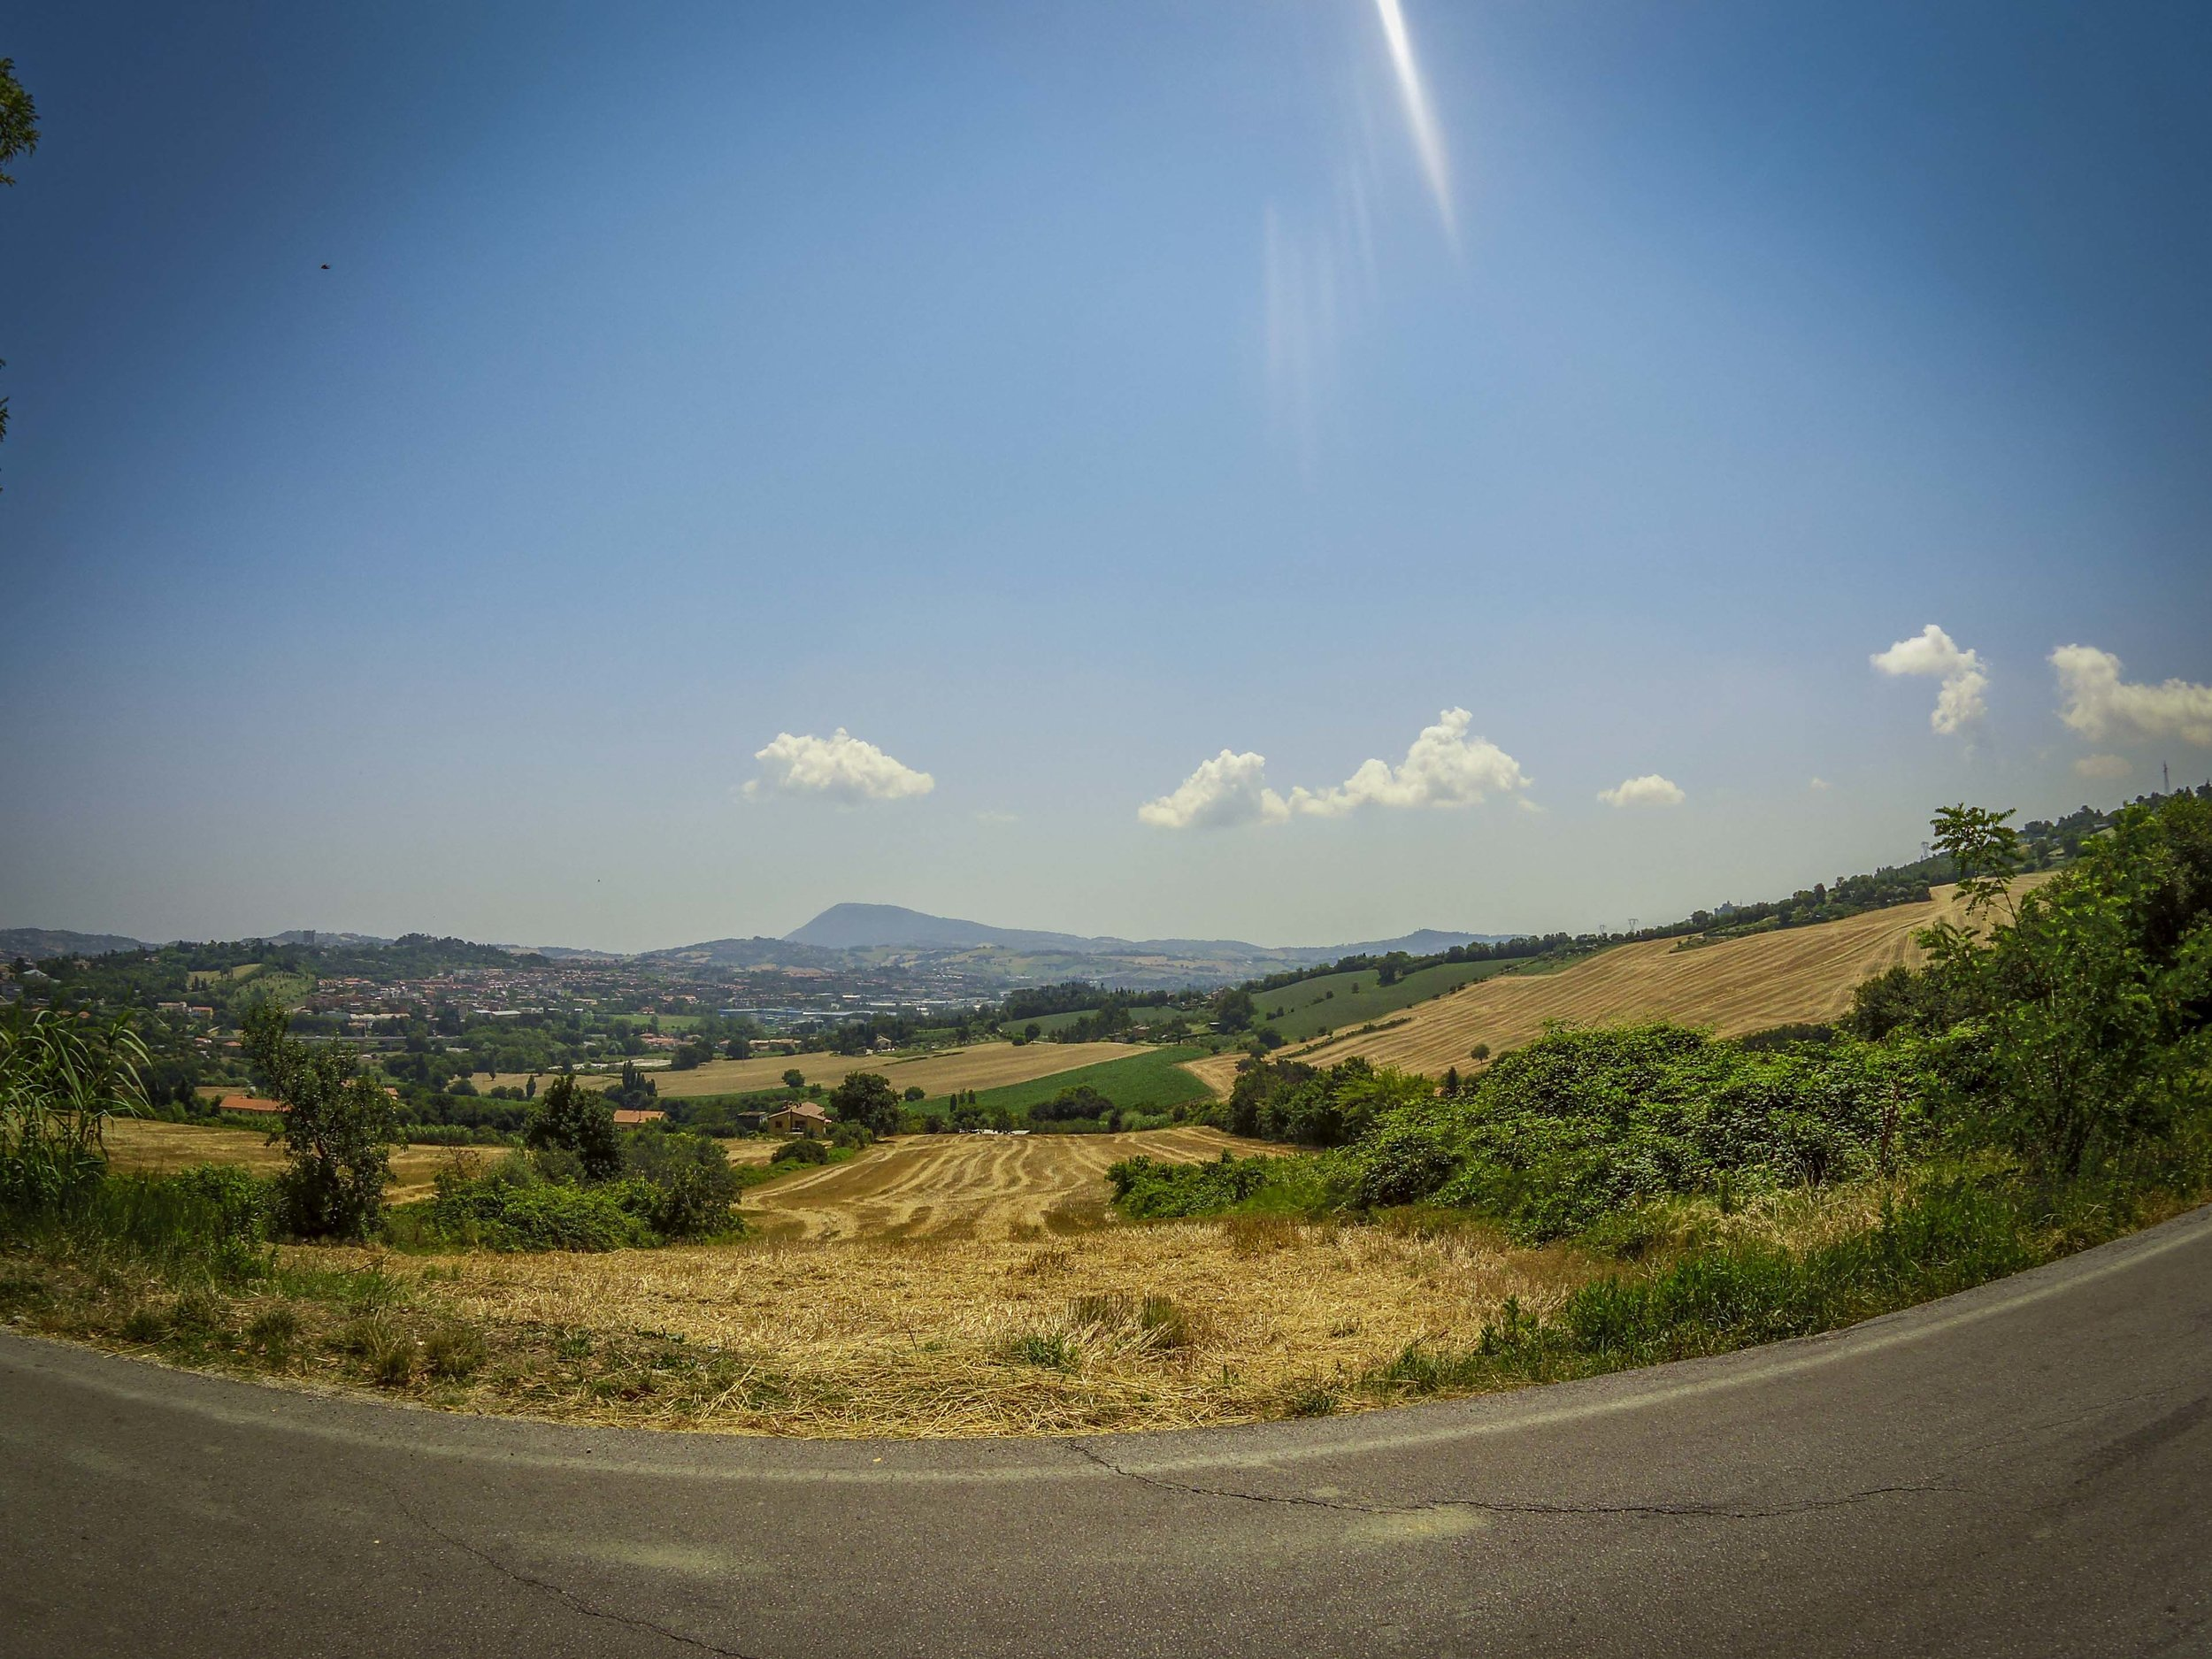 Monte Conero in the horizon.